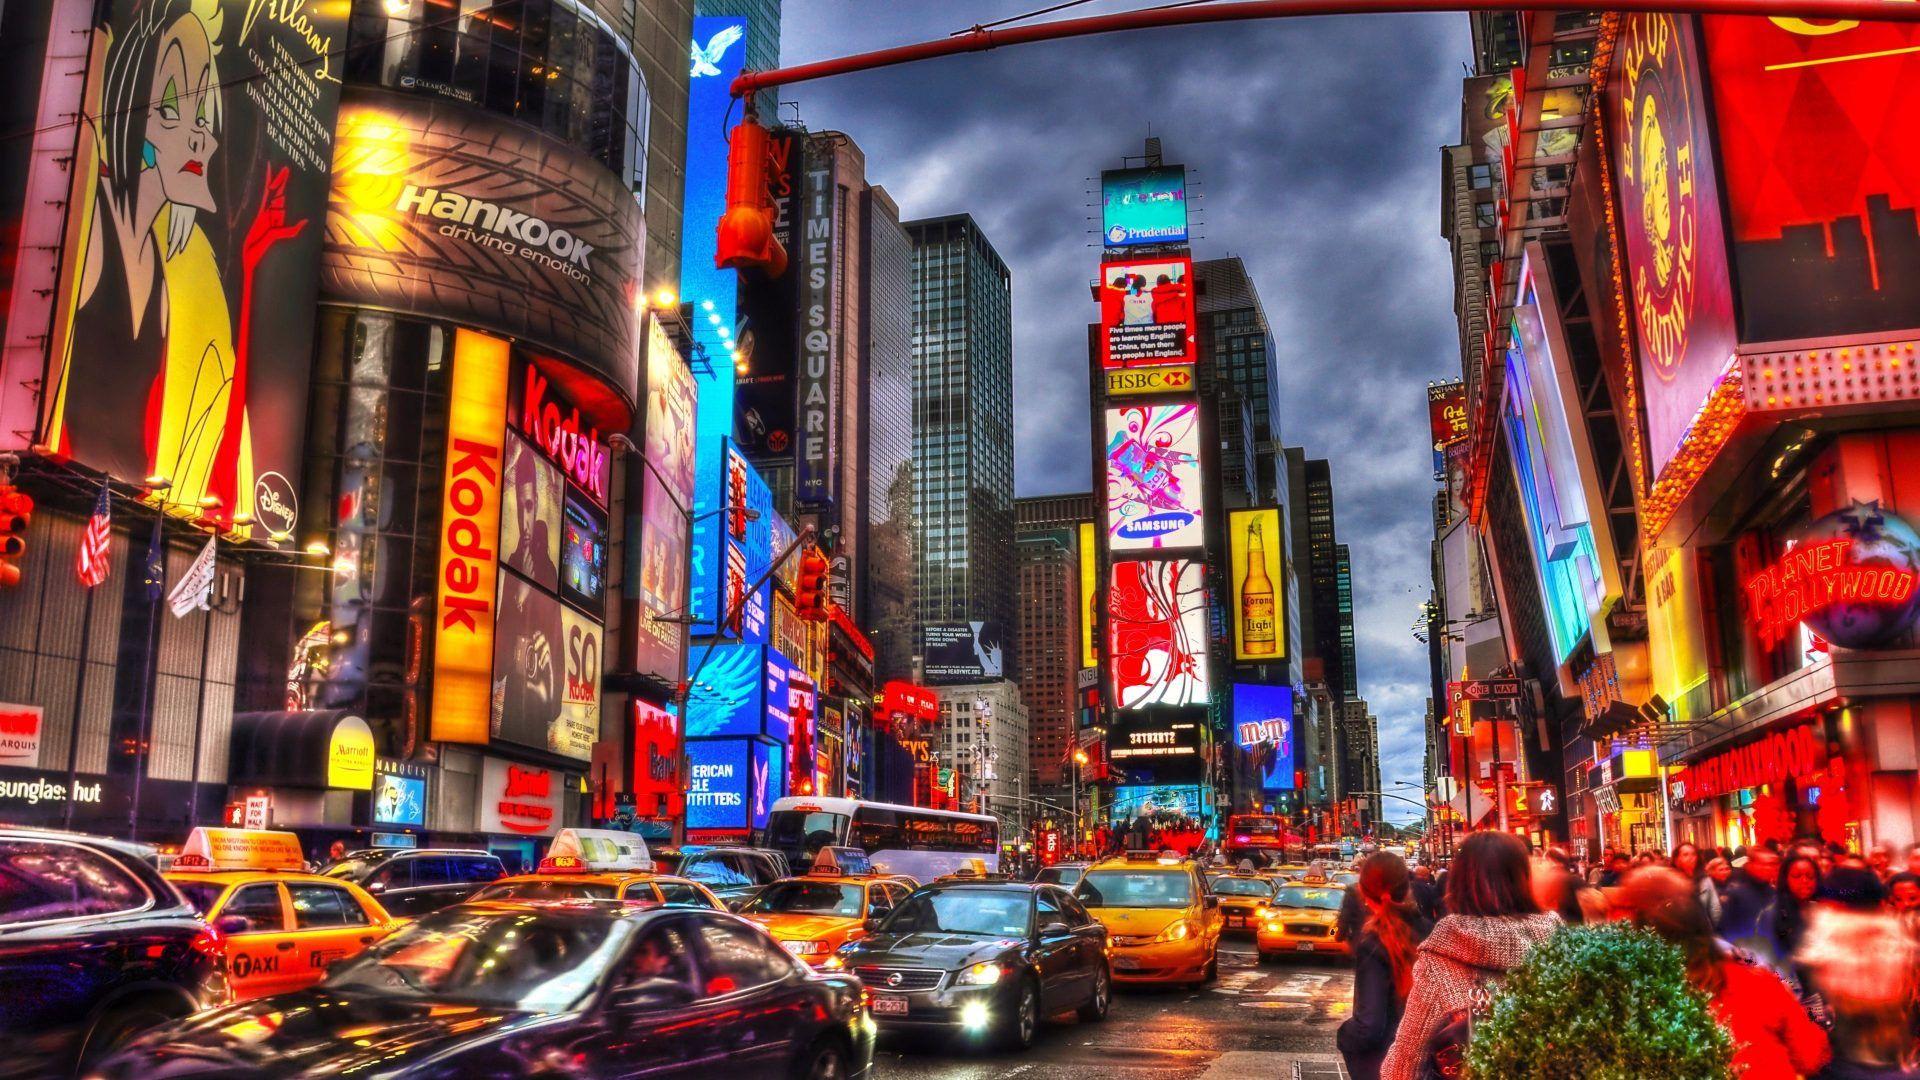 Times Square Wallpaper Https Wallpapersko Com Times Square Wallpaper Html Square Times W Times Square Times Square Photography New York City Buildings